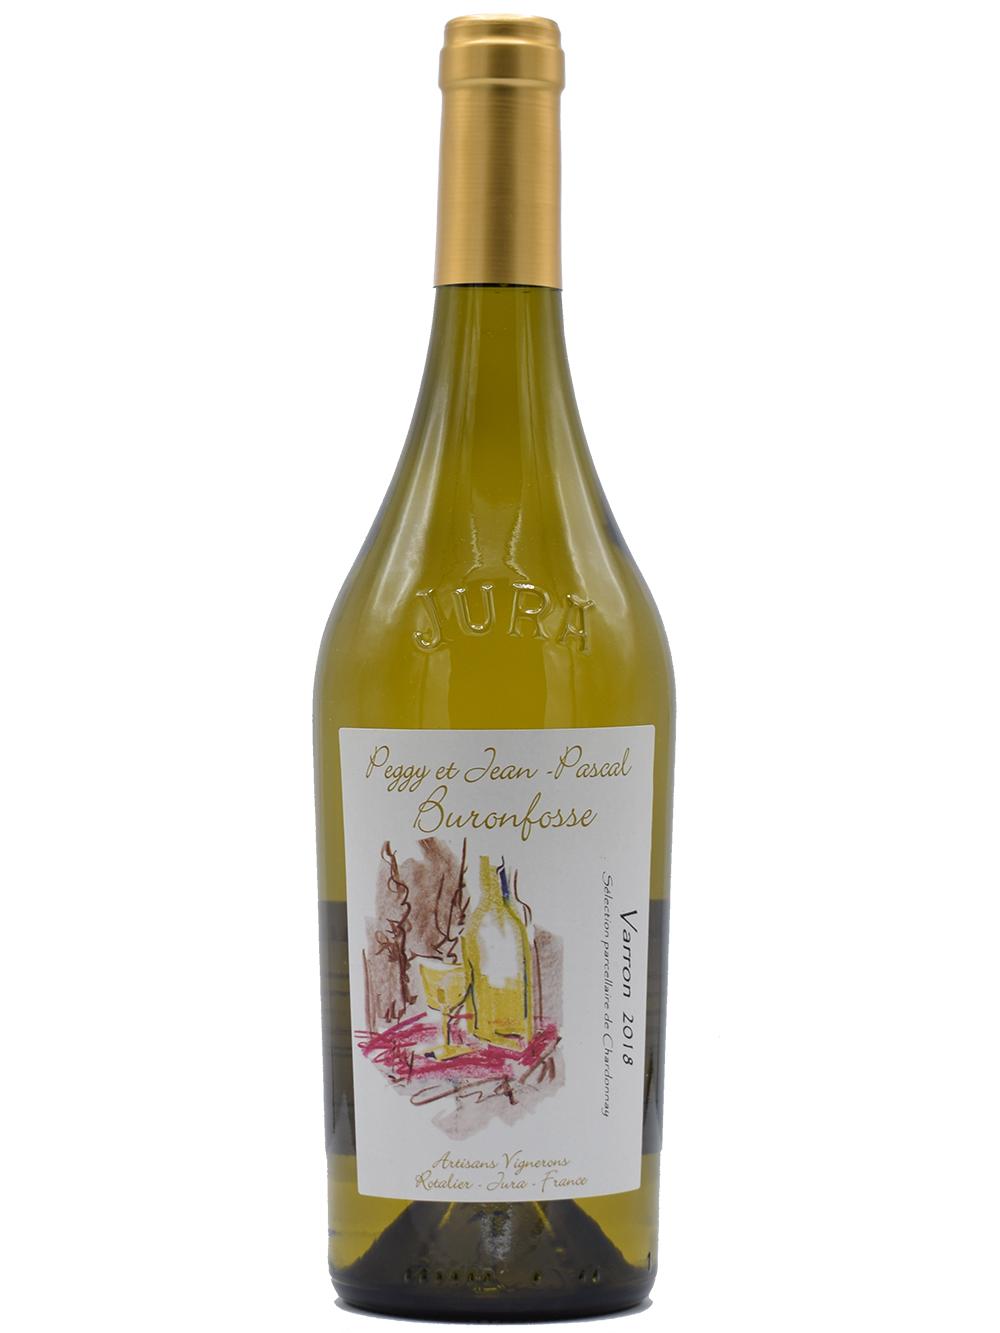 Varron chardonnay